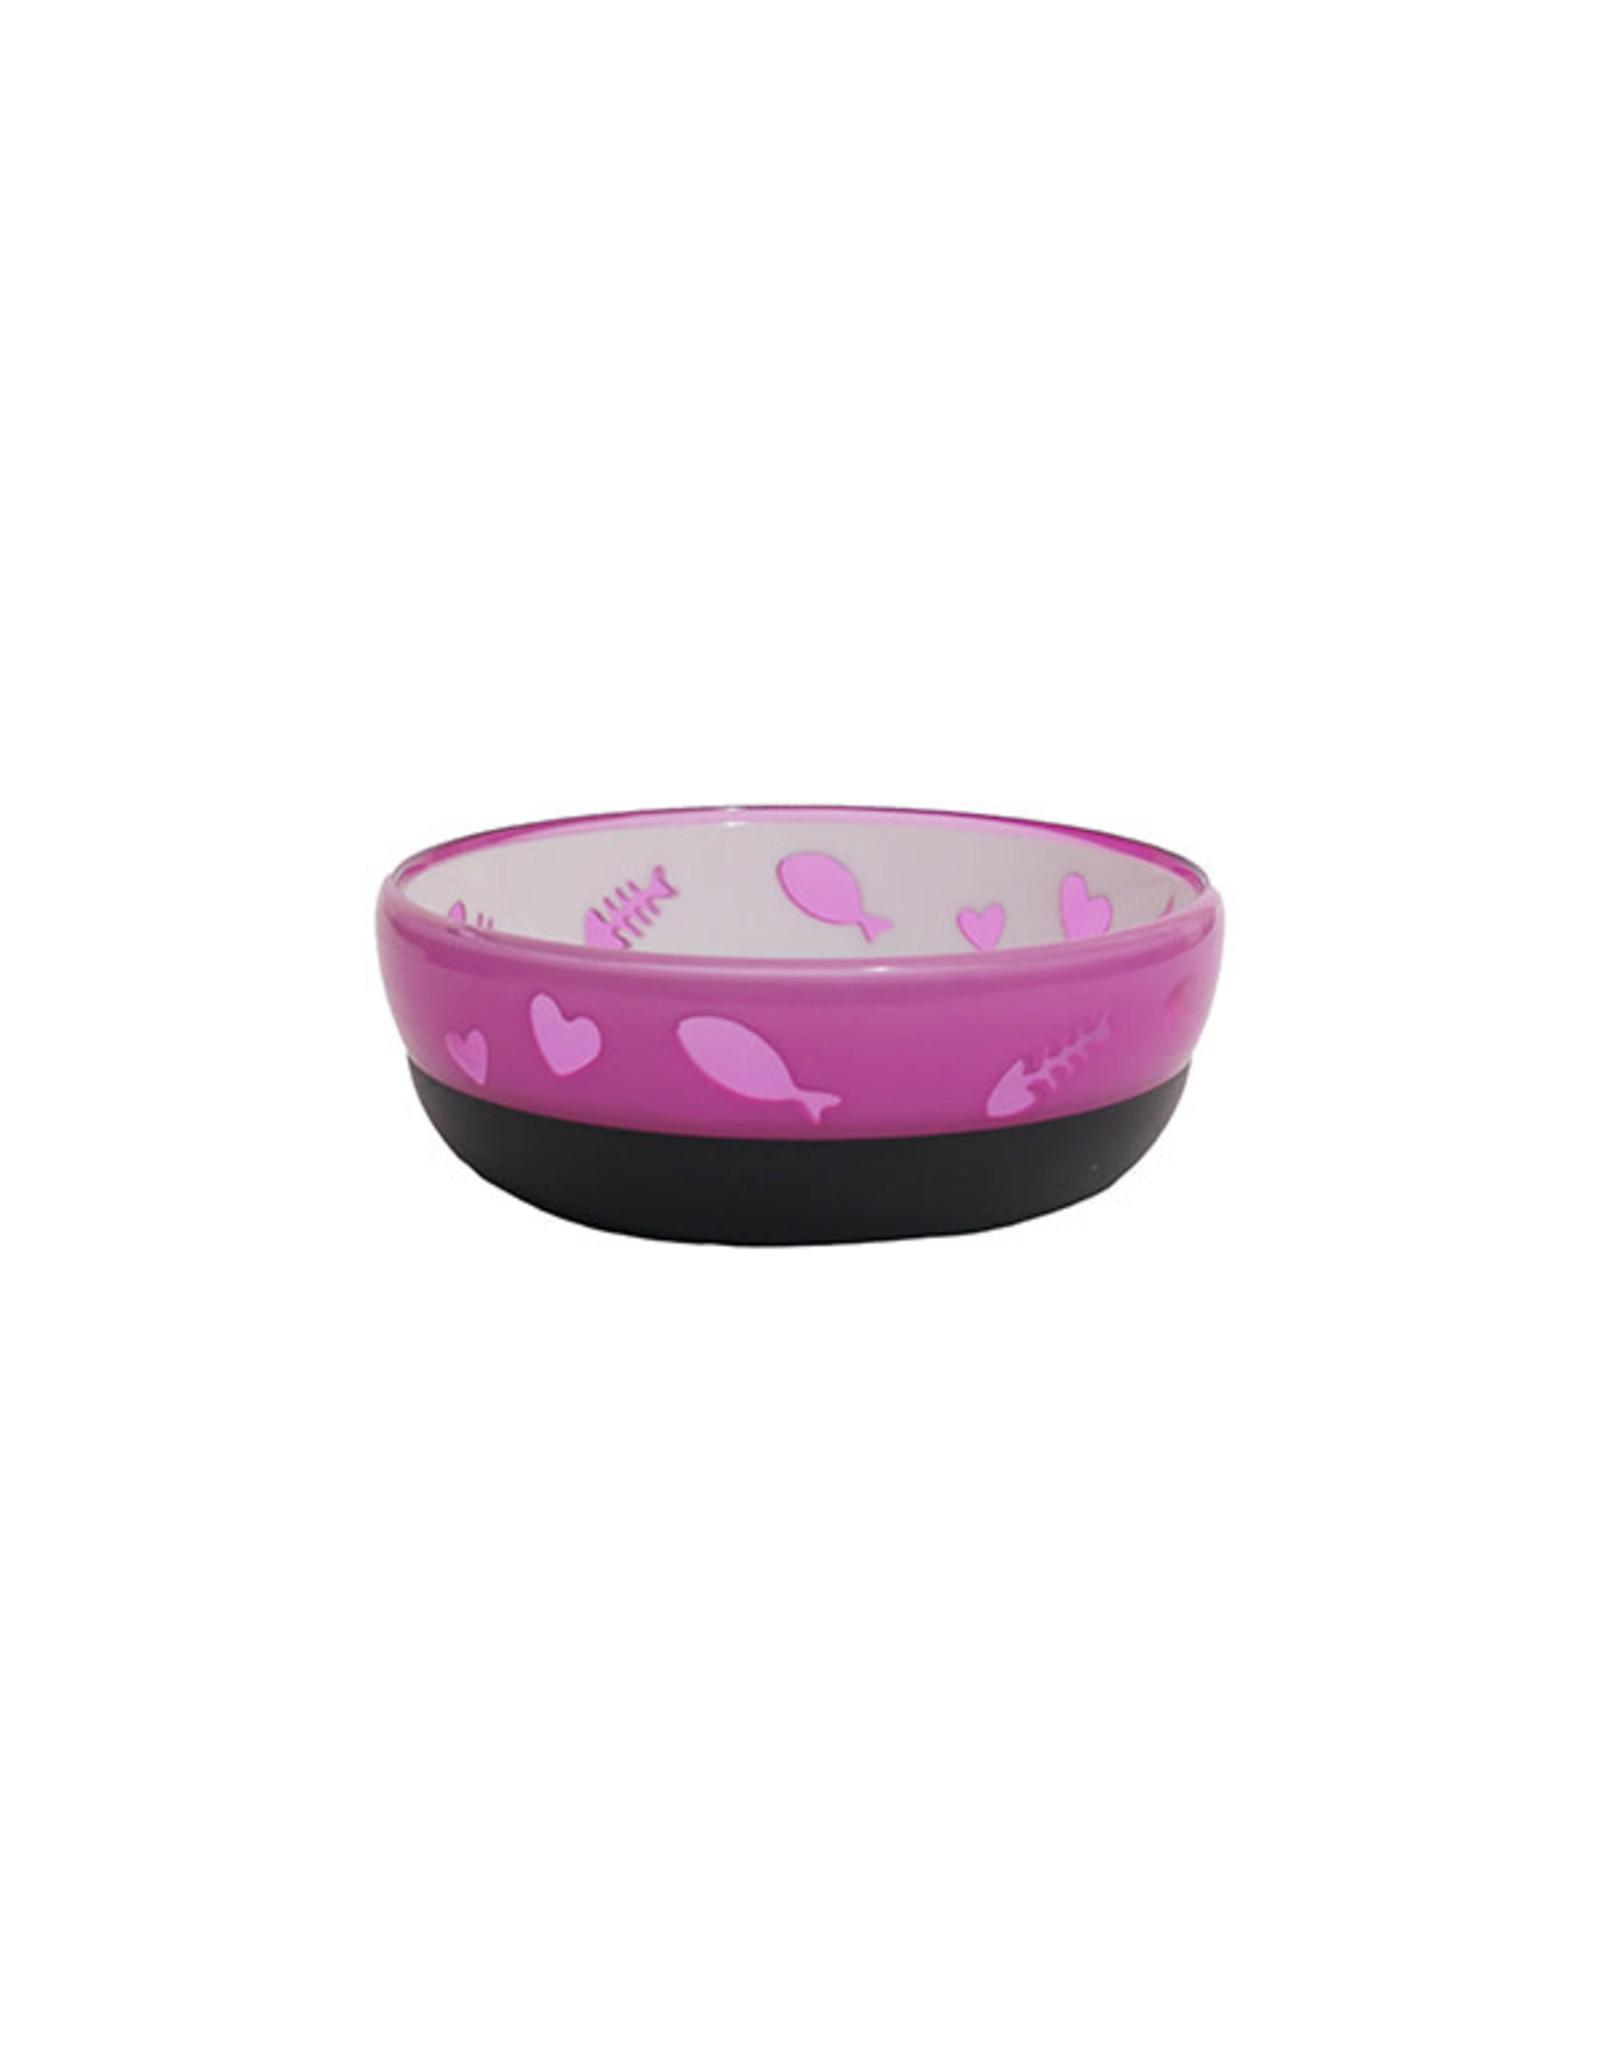 Rosewood Acrylic Anti-slip Purrfectly Purple Cat Dish